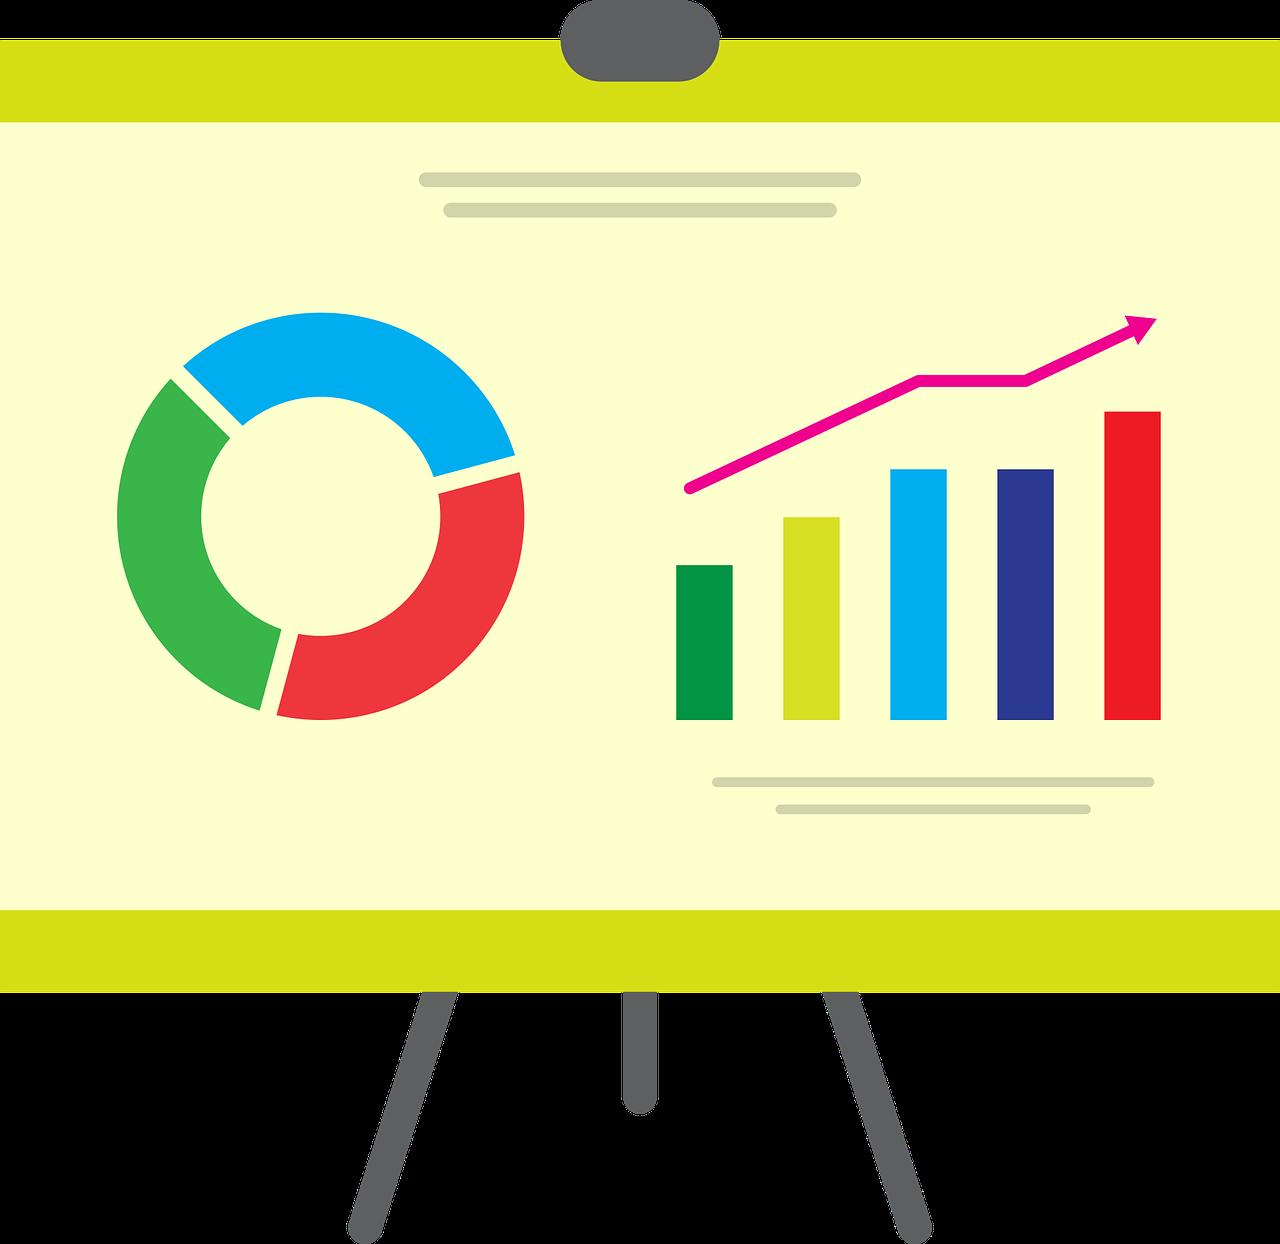 Technical Presentation Skills - Hourly Image